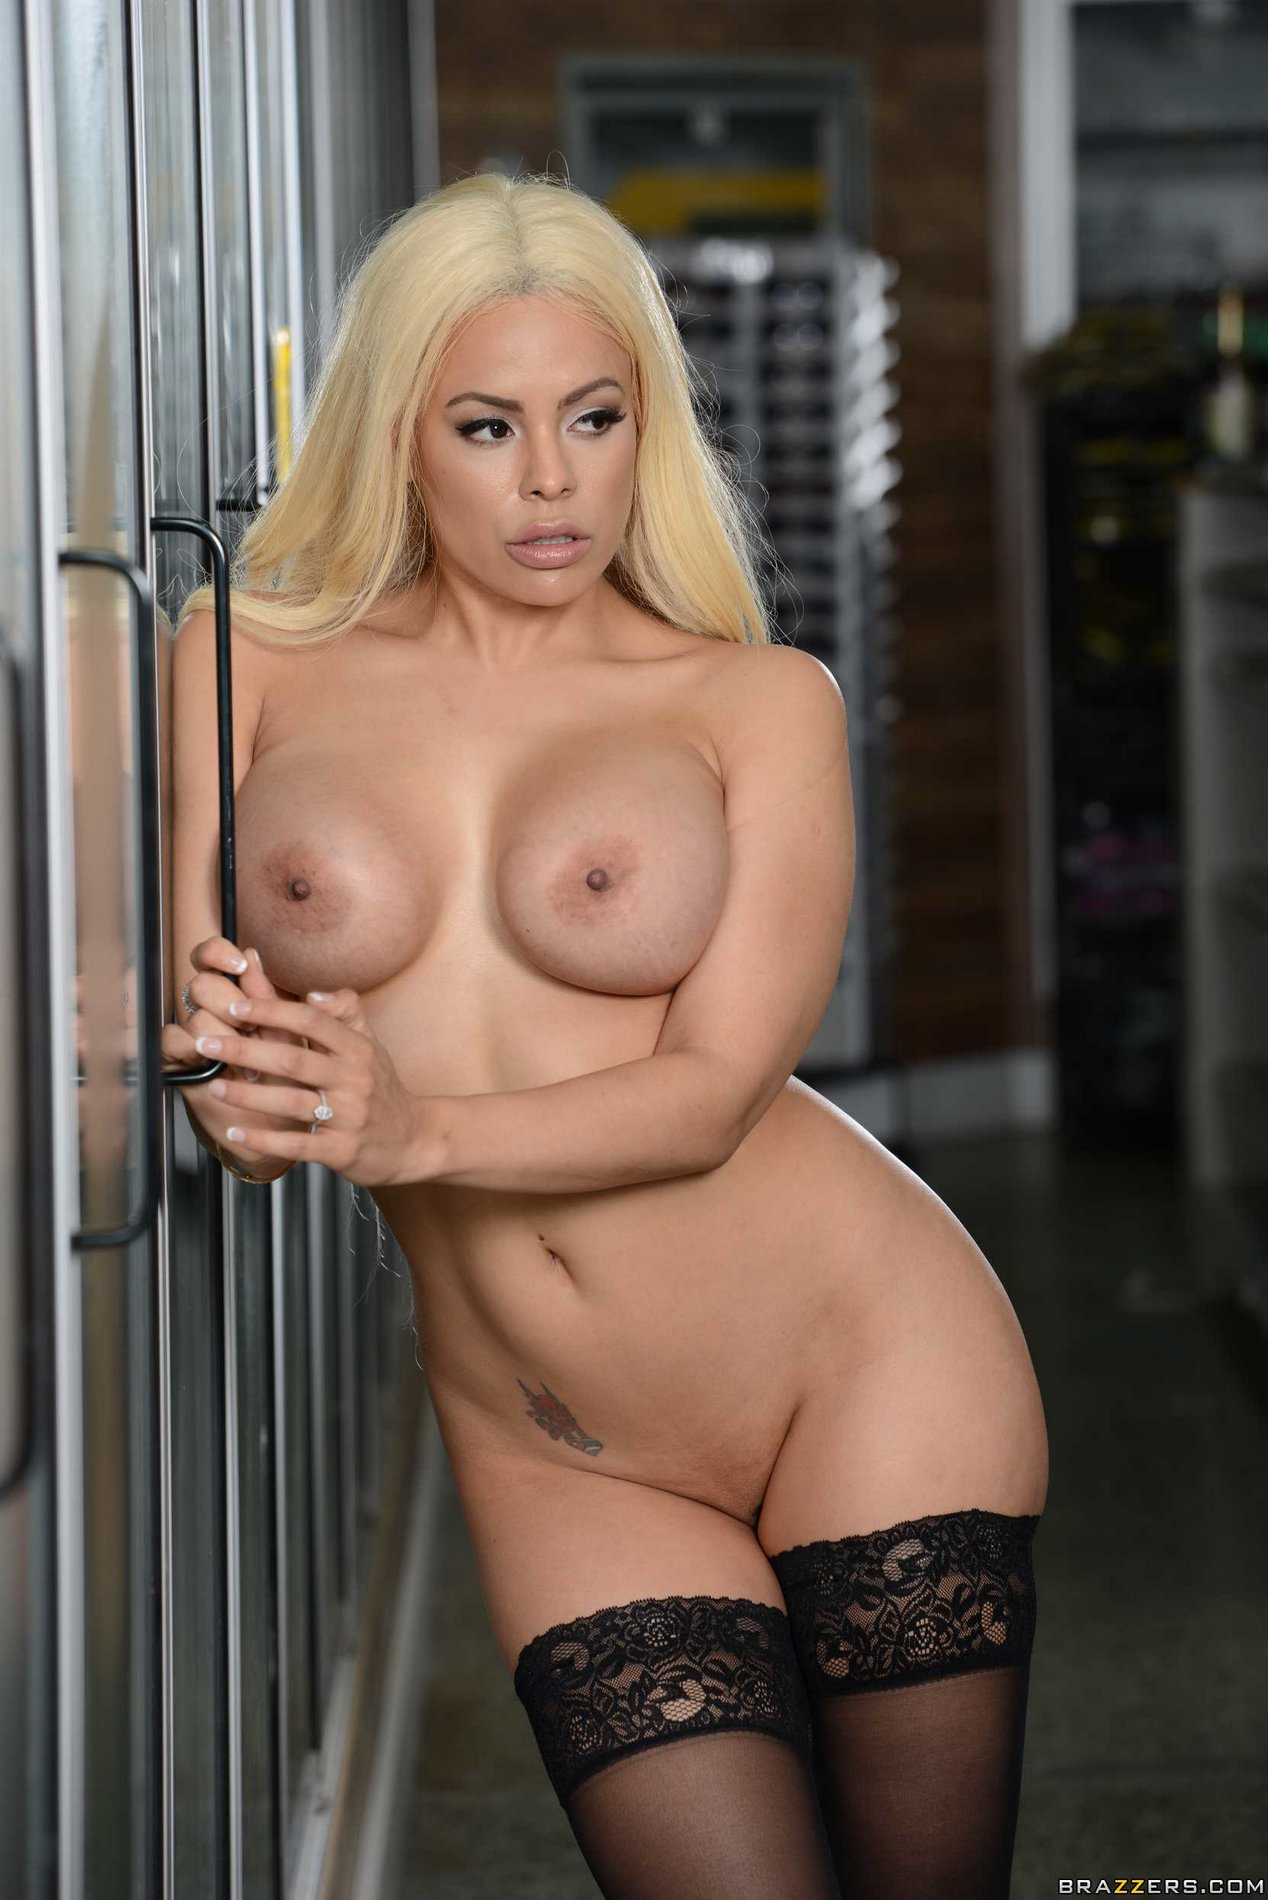 Kellie shanygn porn star-3747